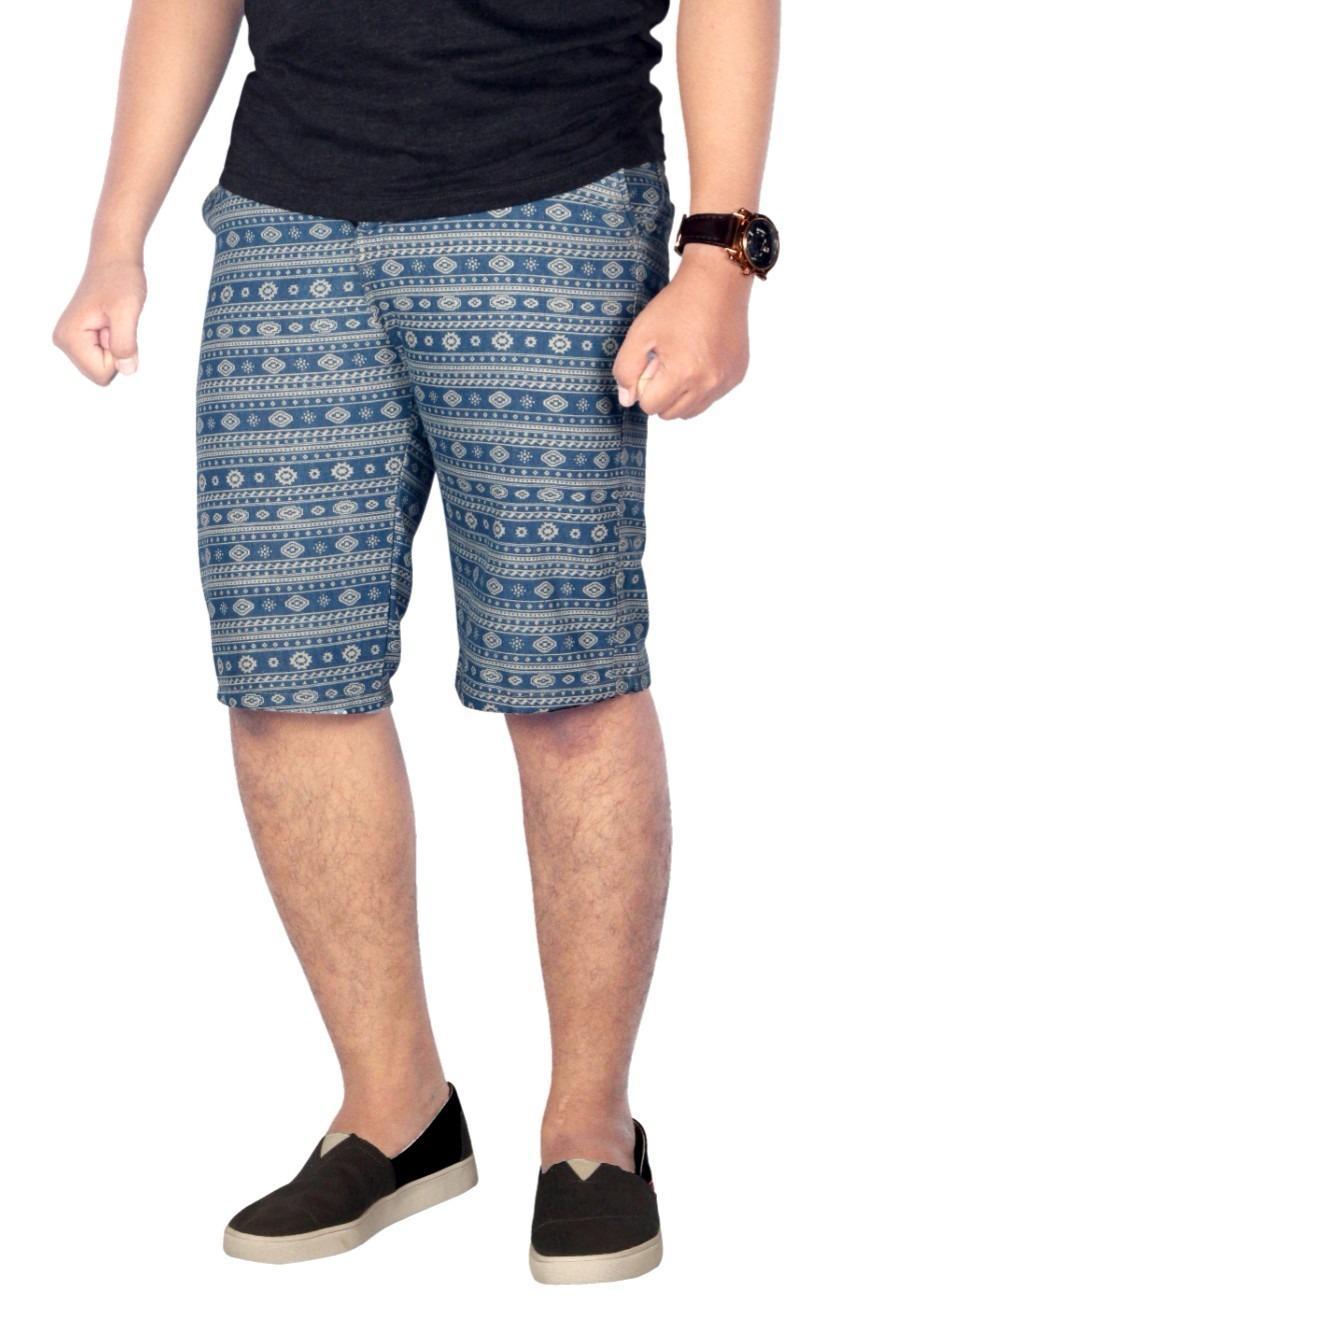 Dgm_Fashion1 Celana Pendek Distro Tribal/ Celana Skinny/Celana Pants/Celana Santai/Celana Casual/Celana Motif/Celana Polos/Celana Pria/Celana Cino/Celana Pantai/Celana Denim/Celana Jeans NR 5519